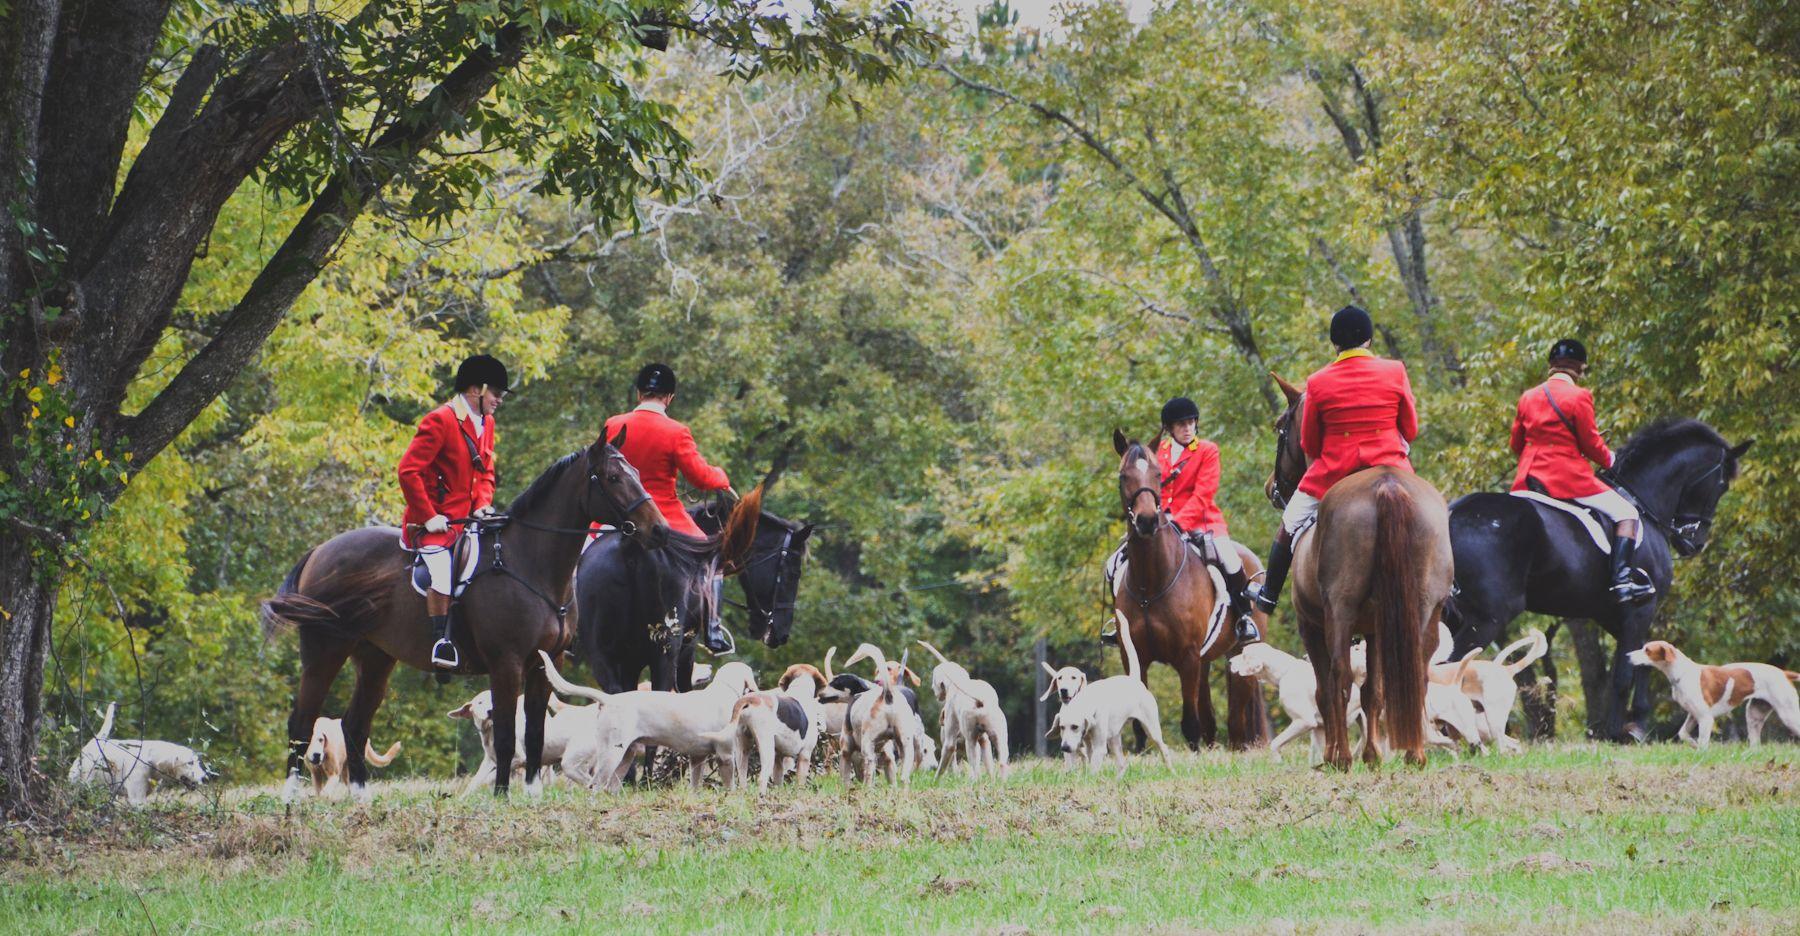 ON HORSE NATION >> Tally Ho! A Georgia Fox Hunting Photo